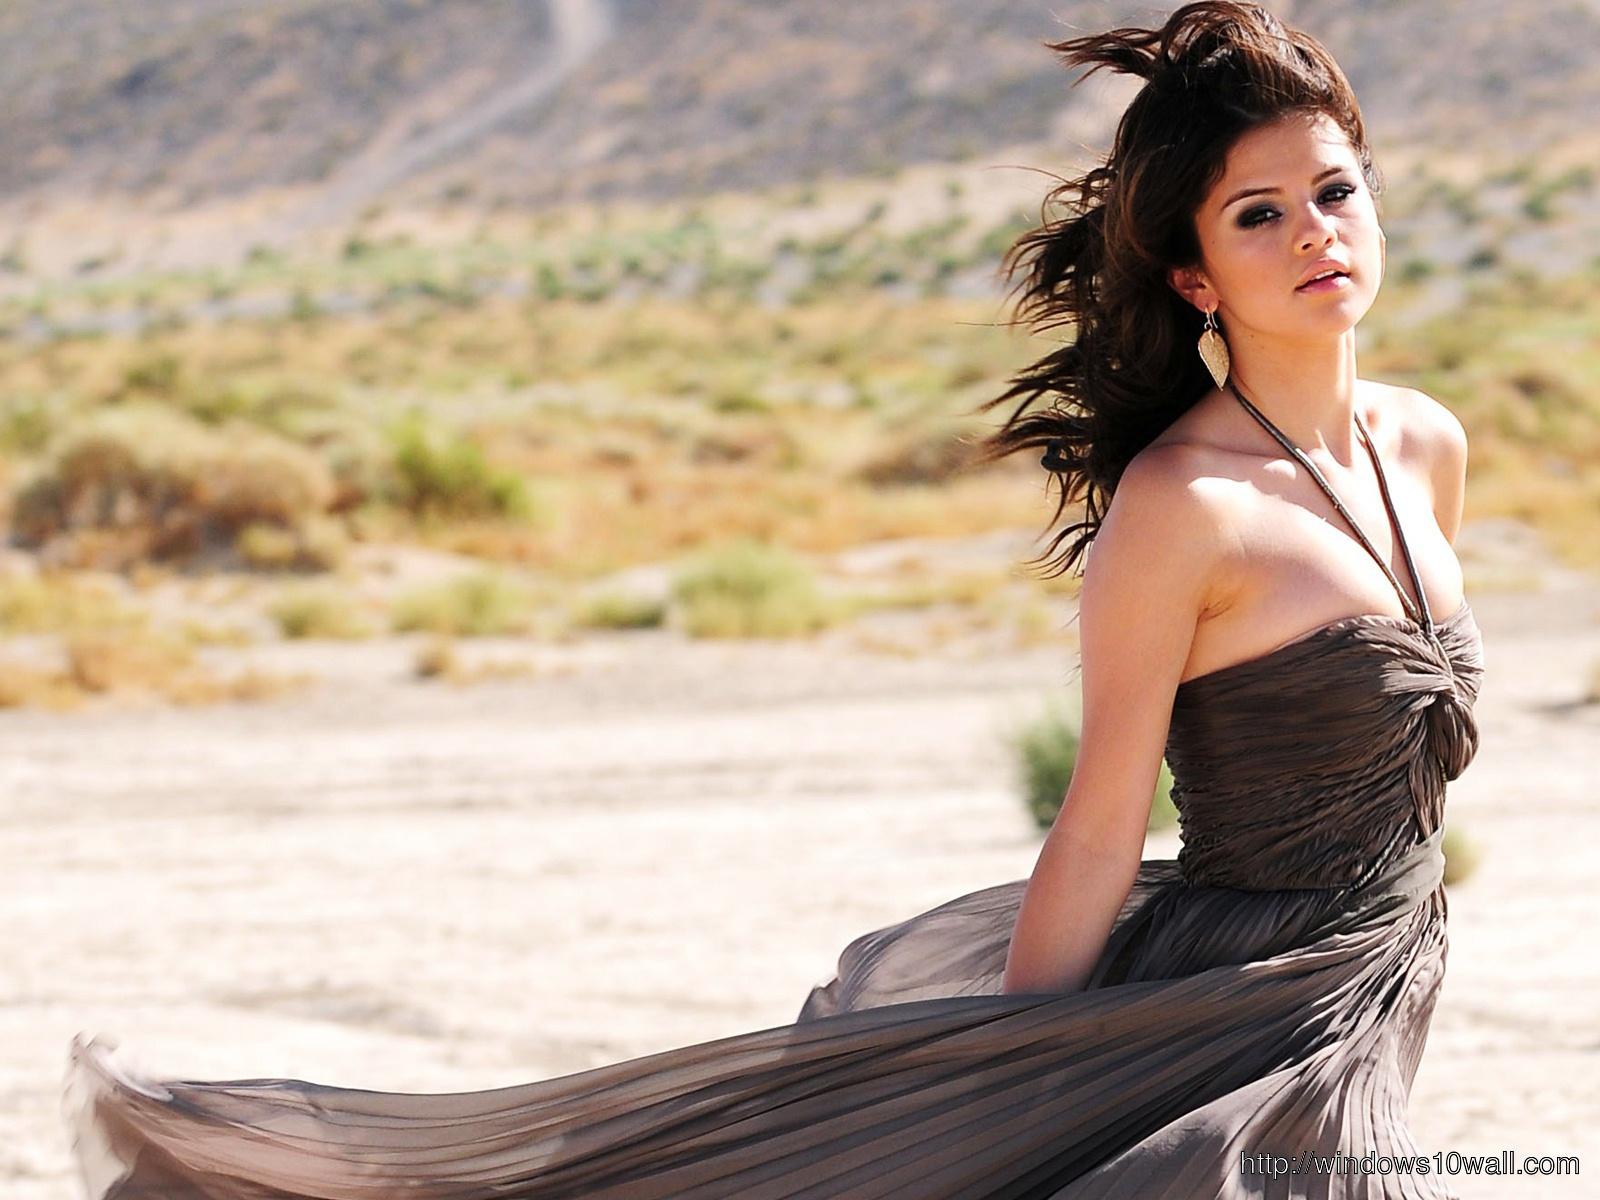 Selena-Gomez-Year-Without-Rain-Wallpaper